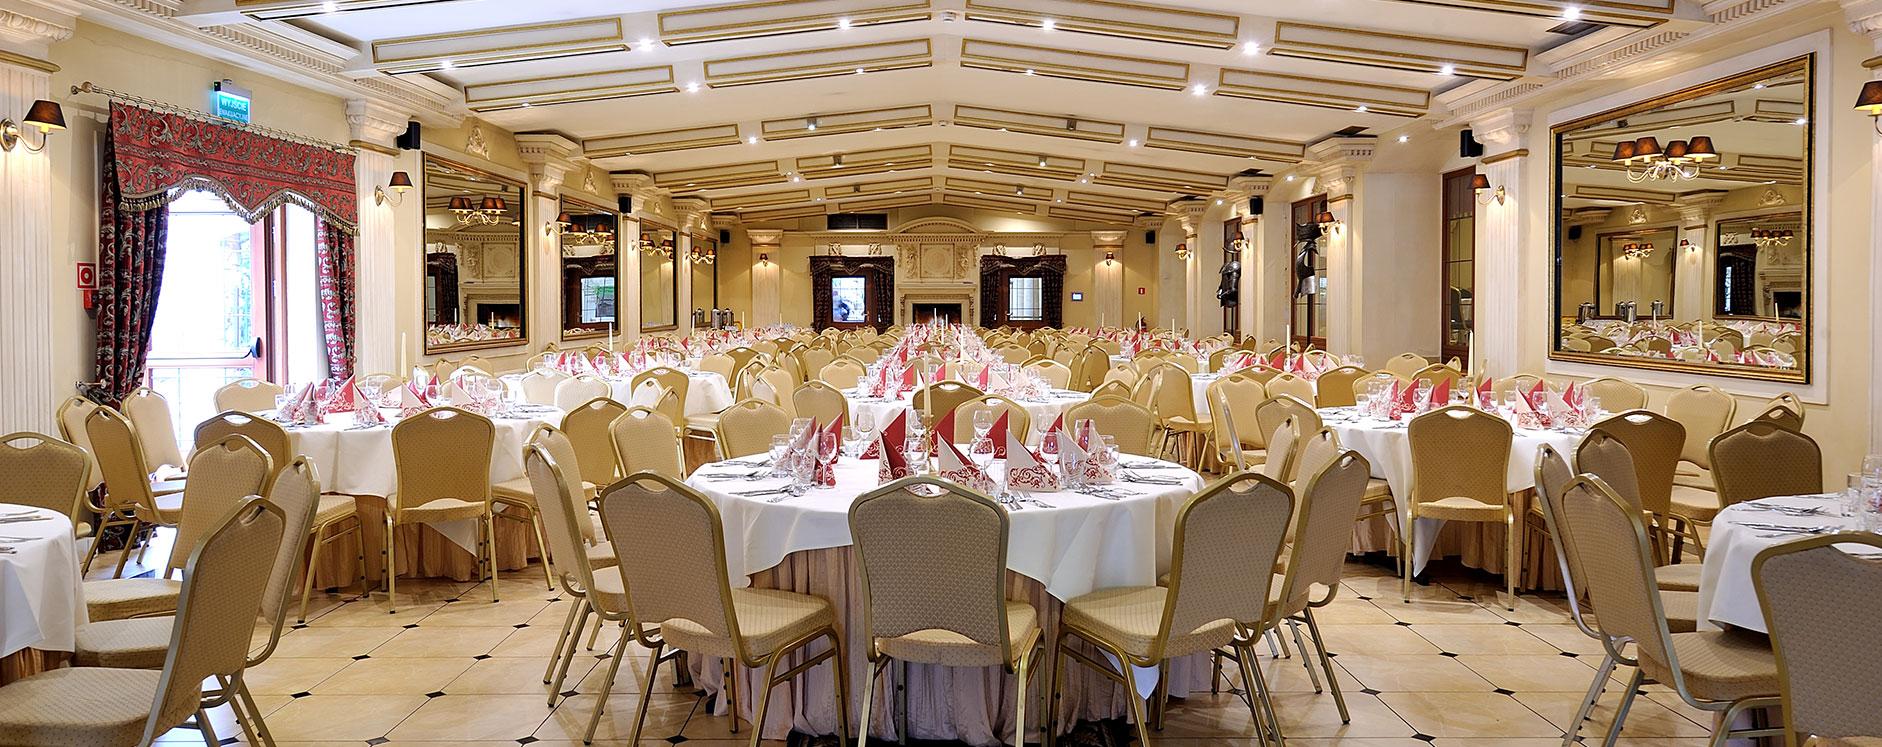 Sala Cesarska Hotel Diament Arsenal Palace